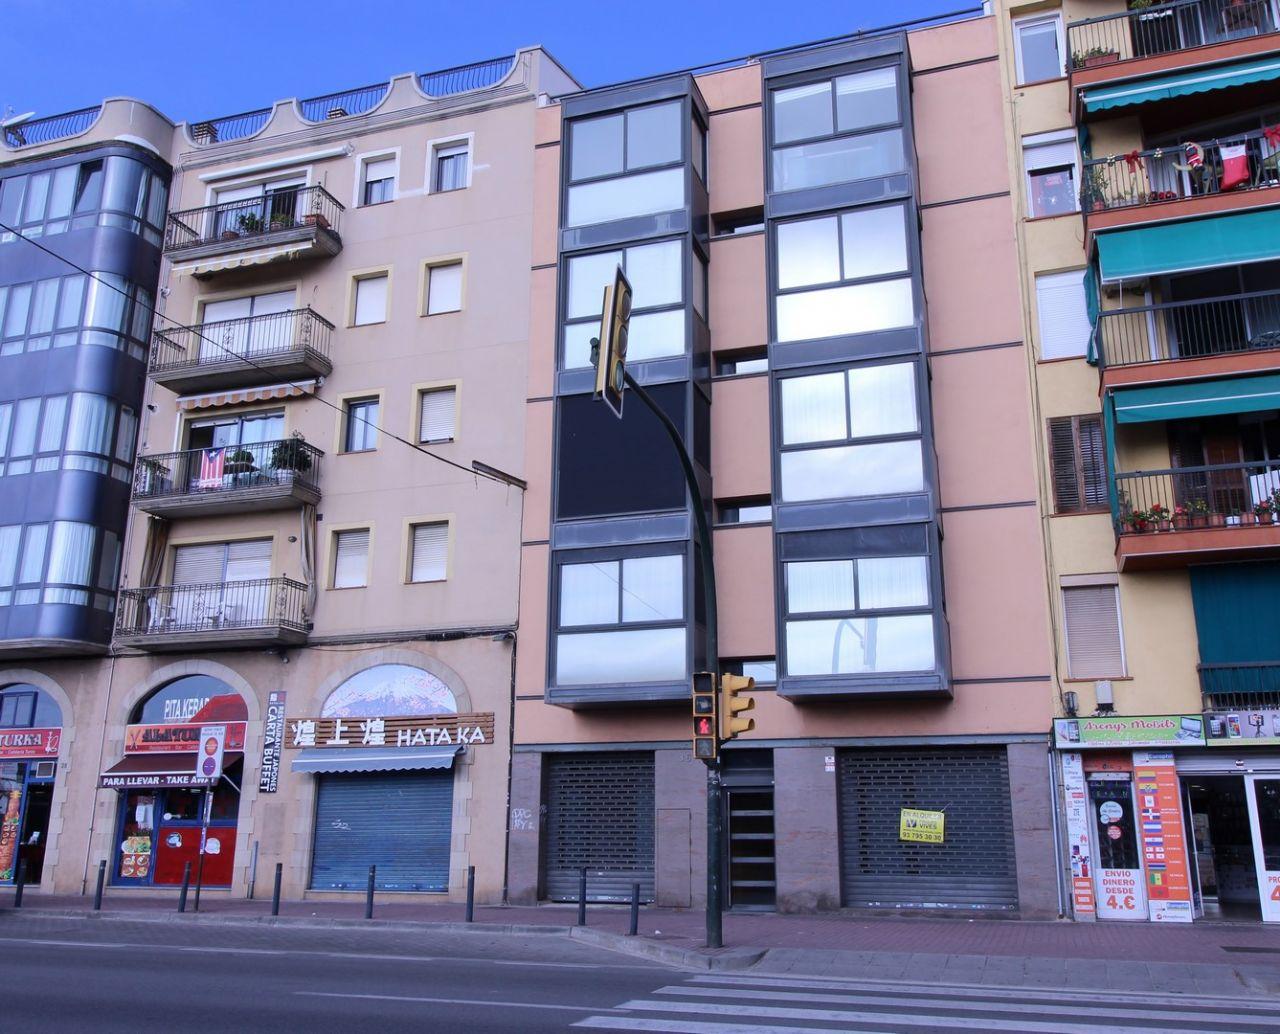 Local comercial en Arenys de Mar, ESTACION, alquiler